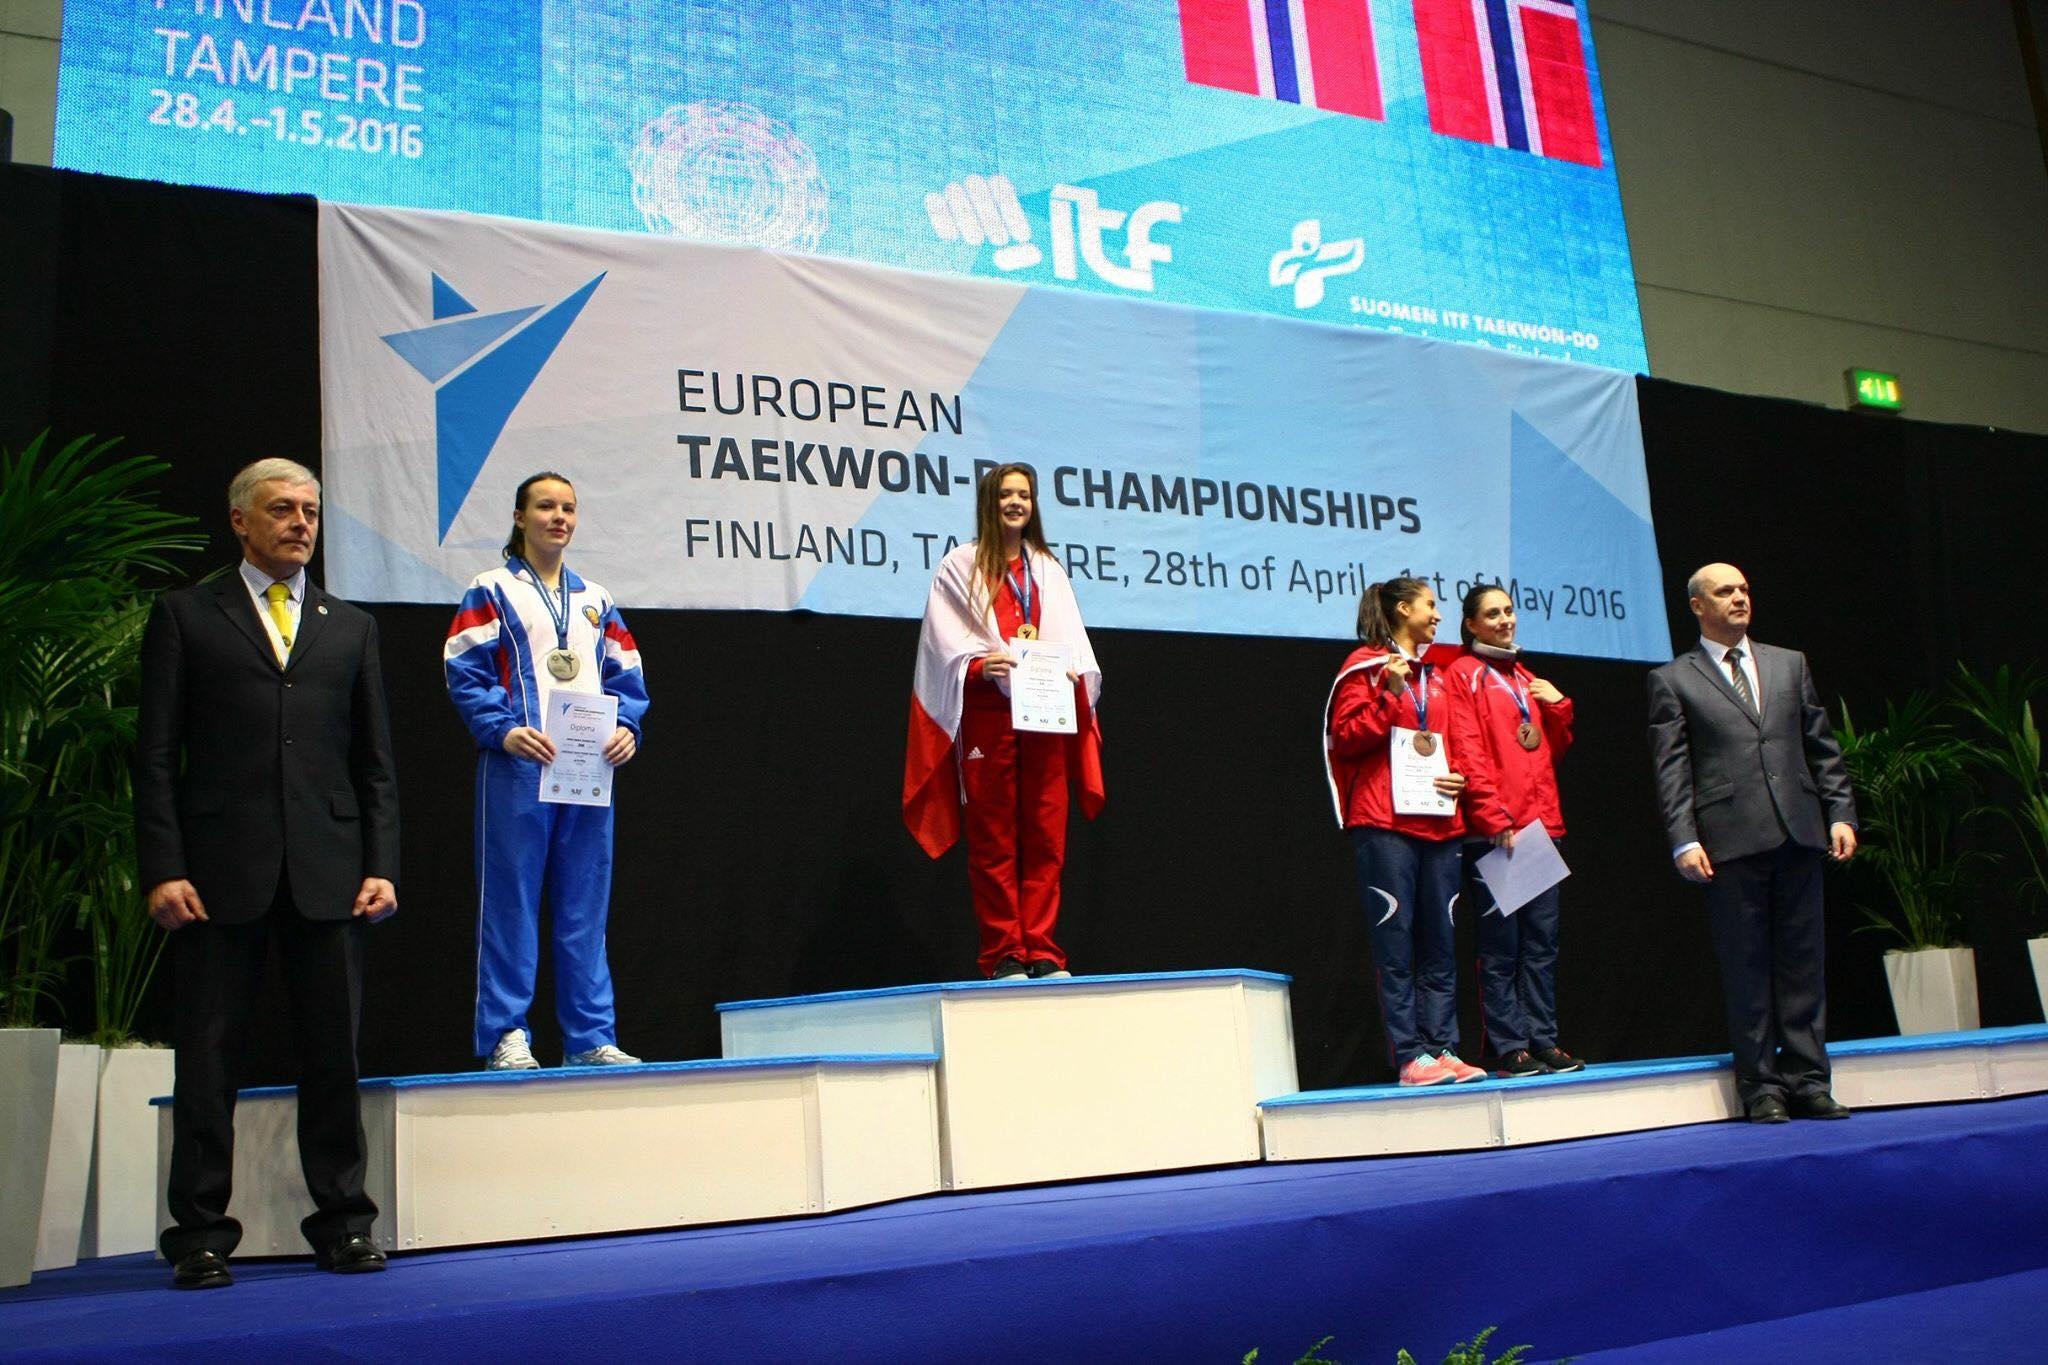 Kamila Kasprzak na podium